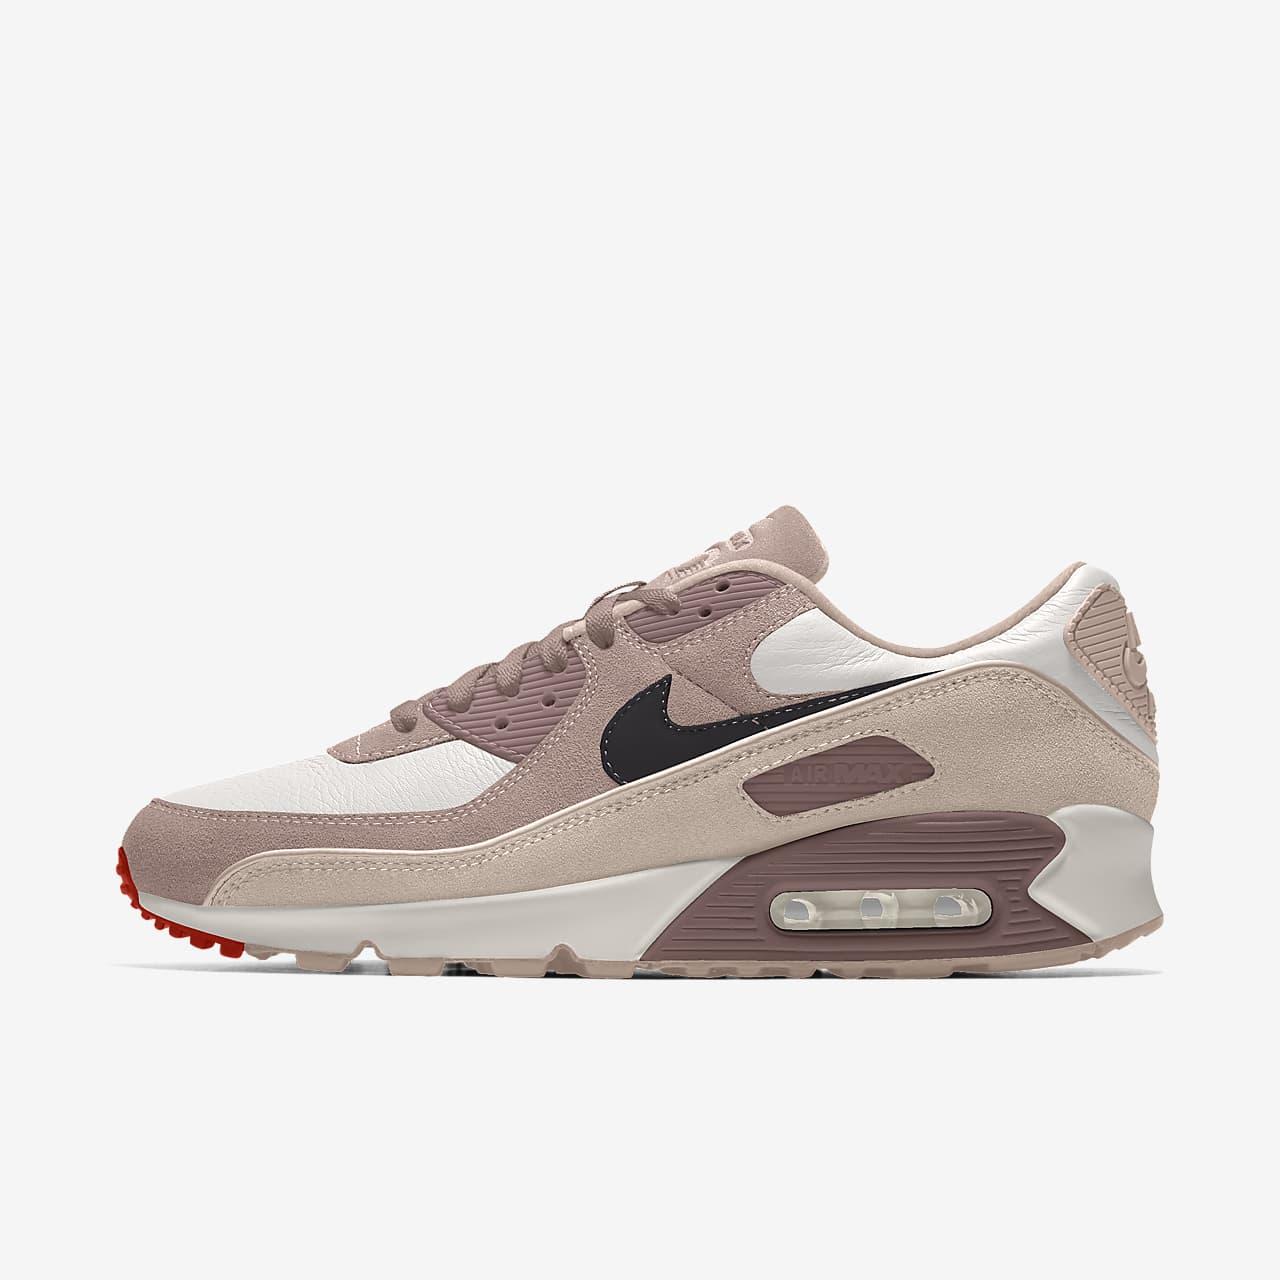 Nike Air Max 90 Unlocked By You Custom Women's Shoe